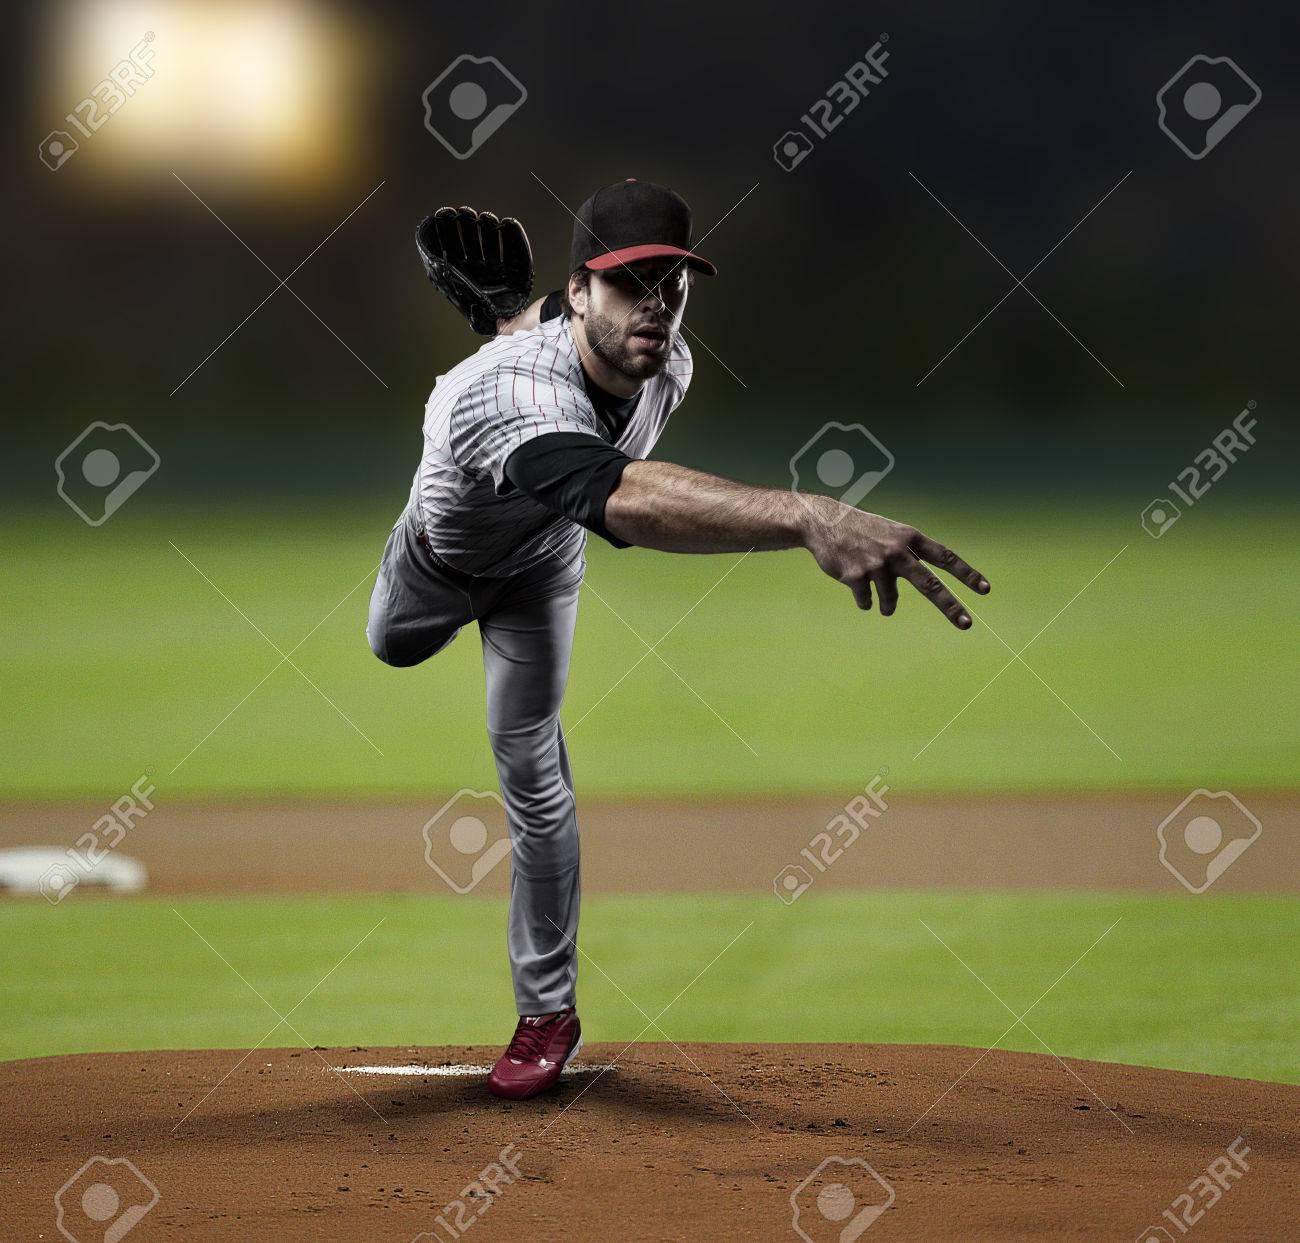 Pitcher Player throwing a ball, on a baseball Stadium. - 27529281